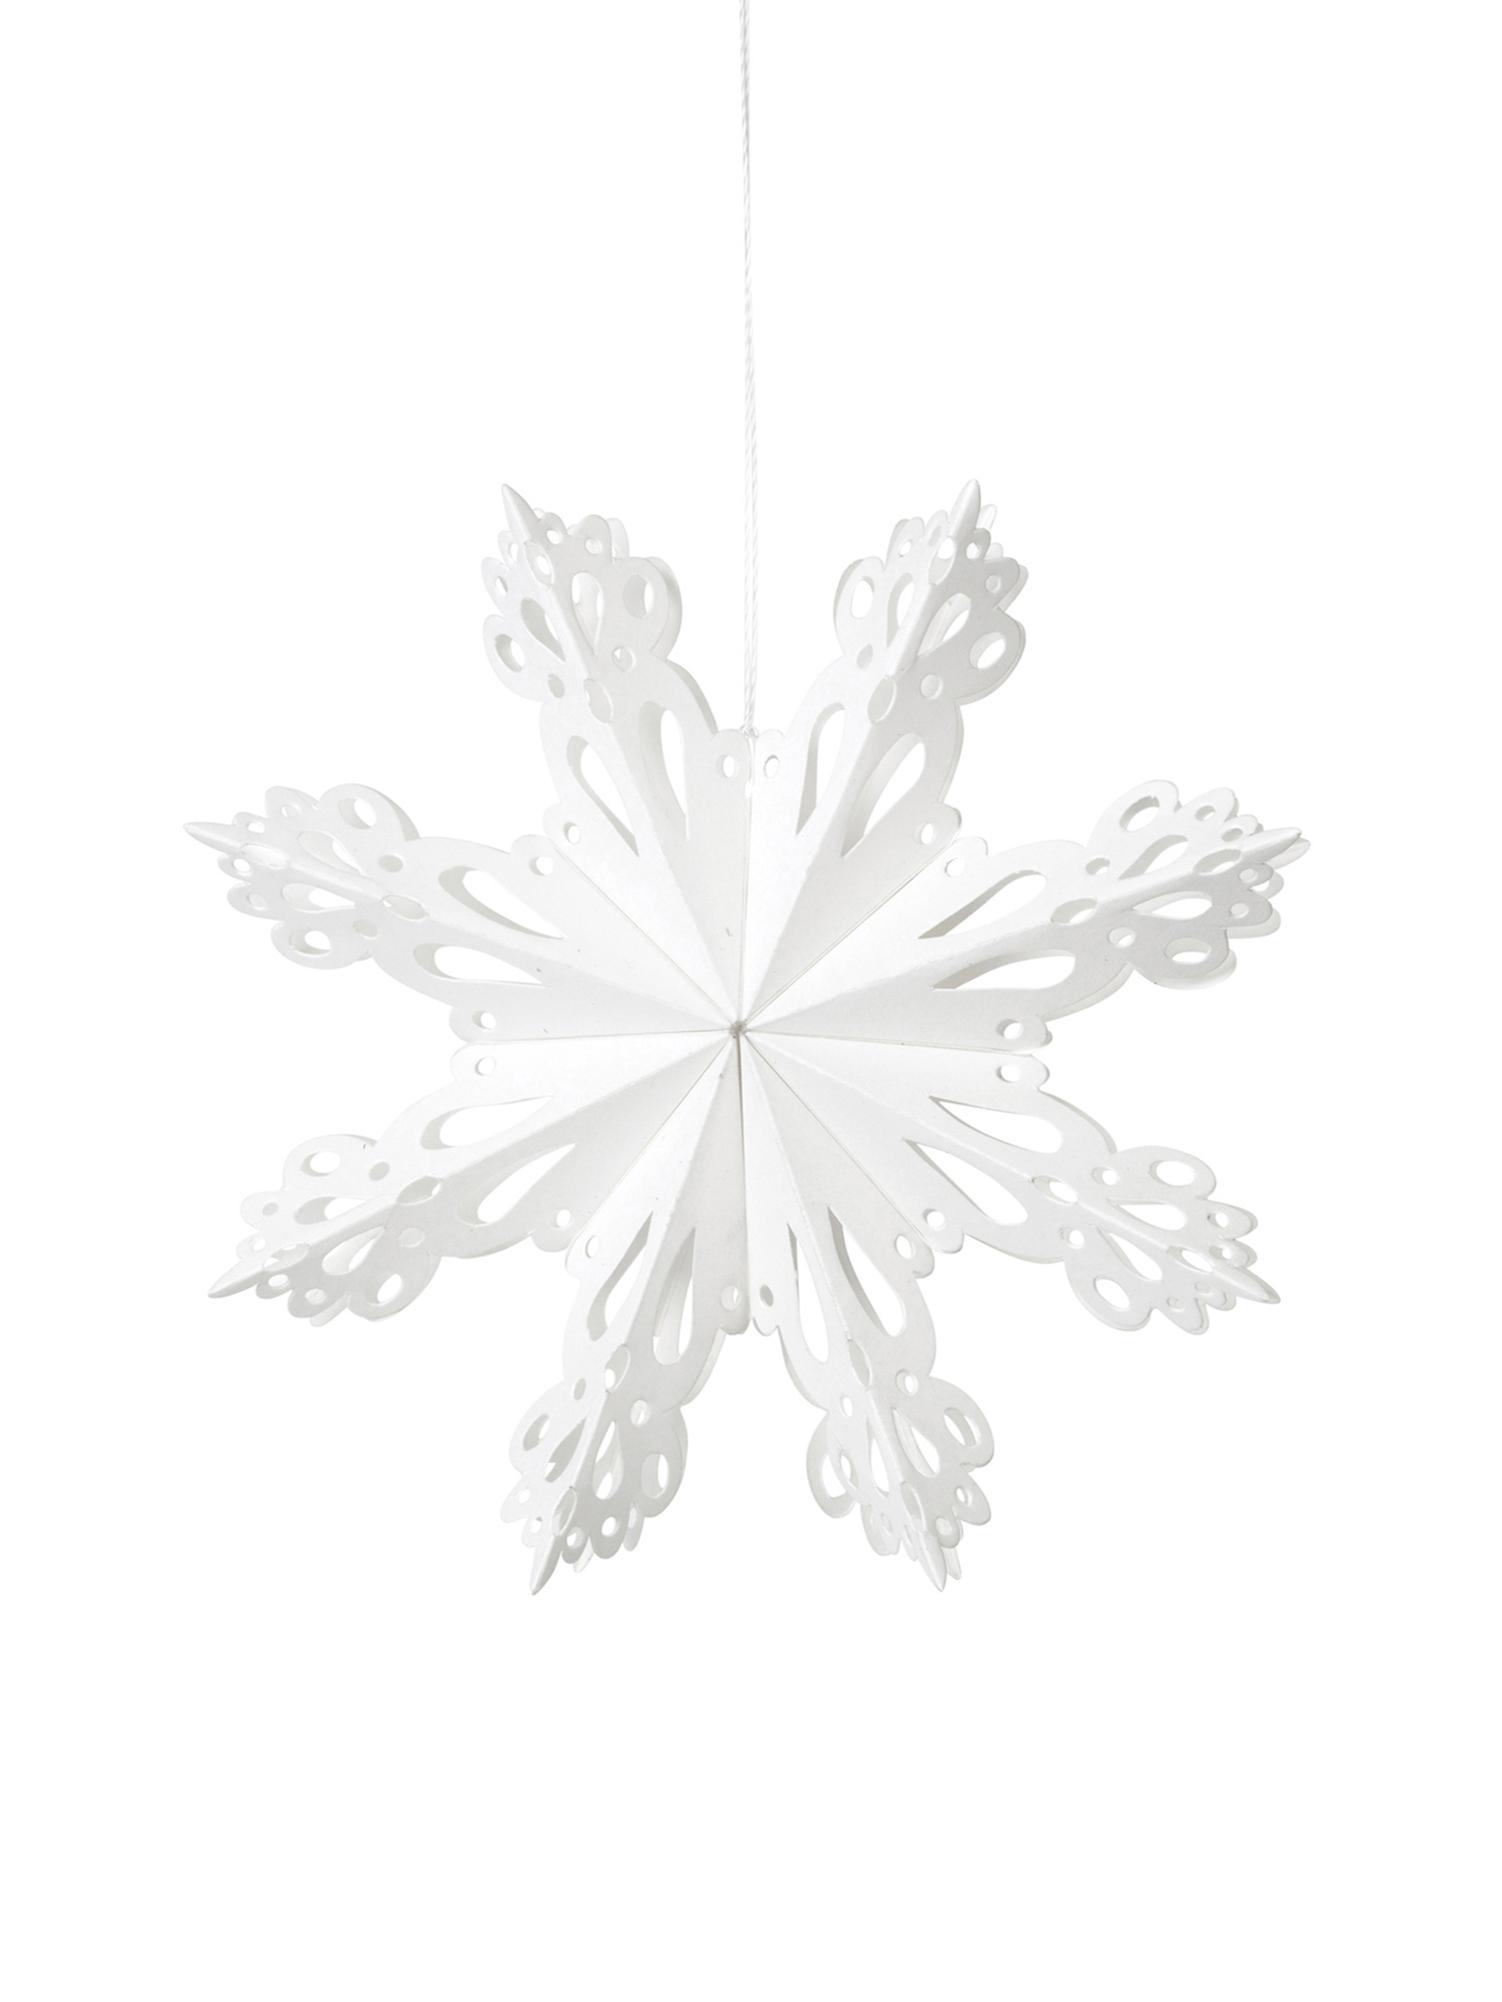 Adorno navideño XLSnowflake, Papel, Blanco, Ø 15 cm